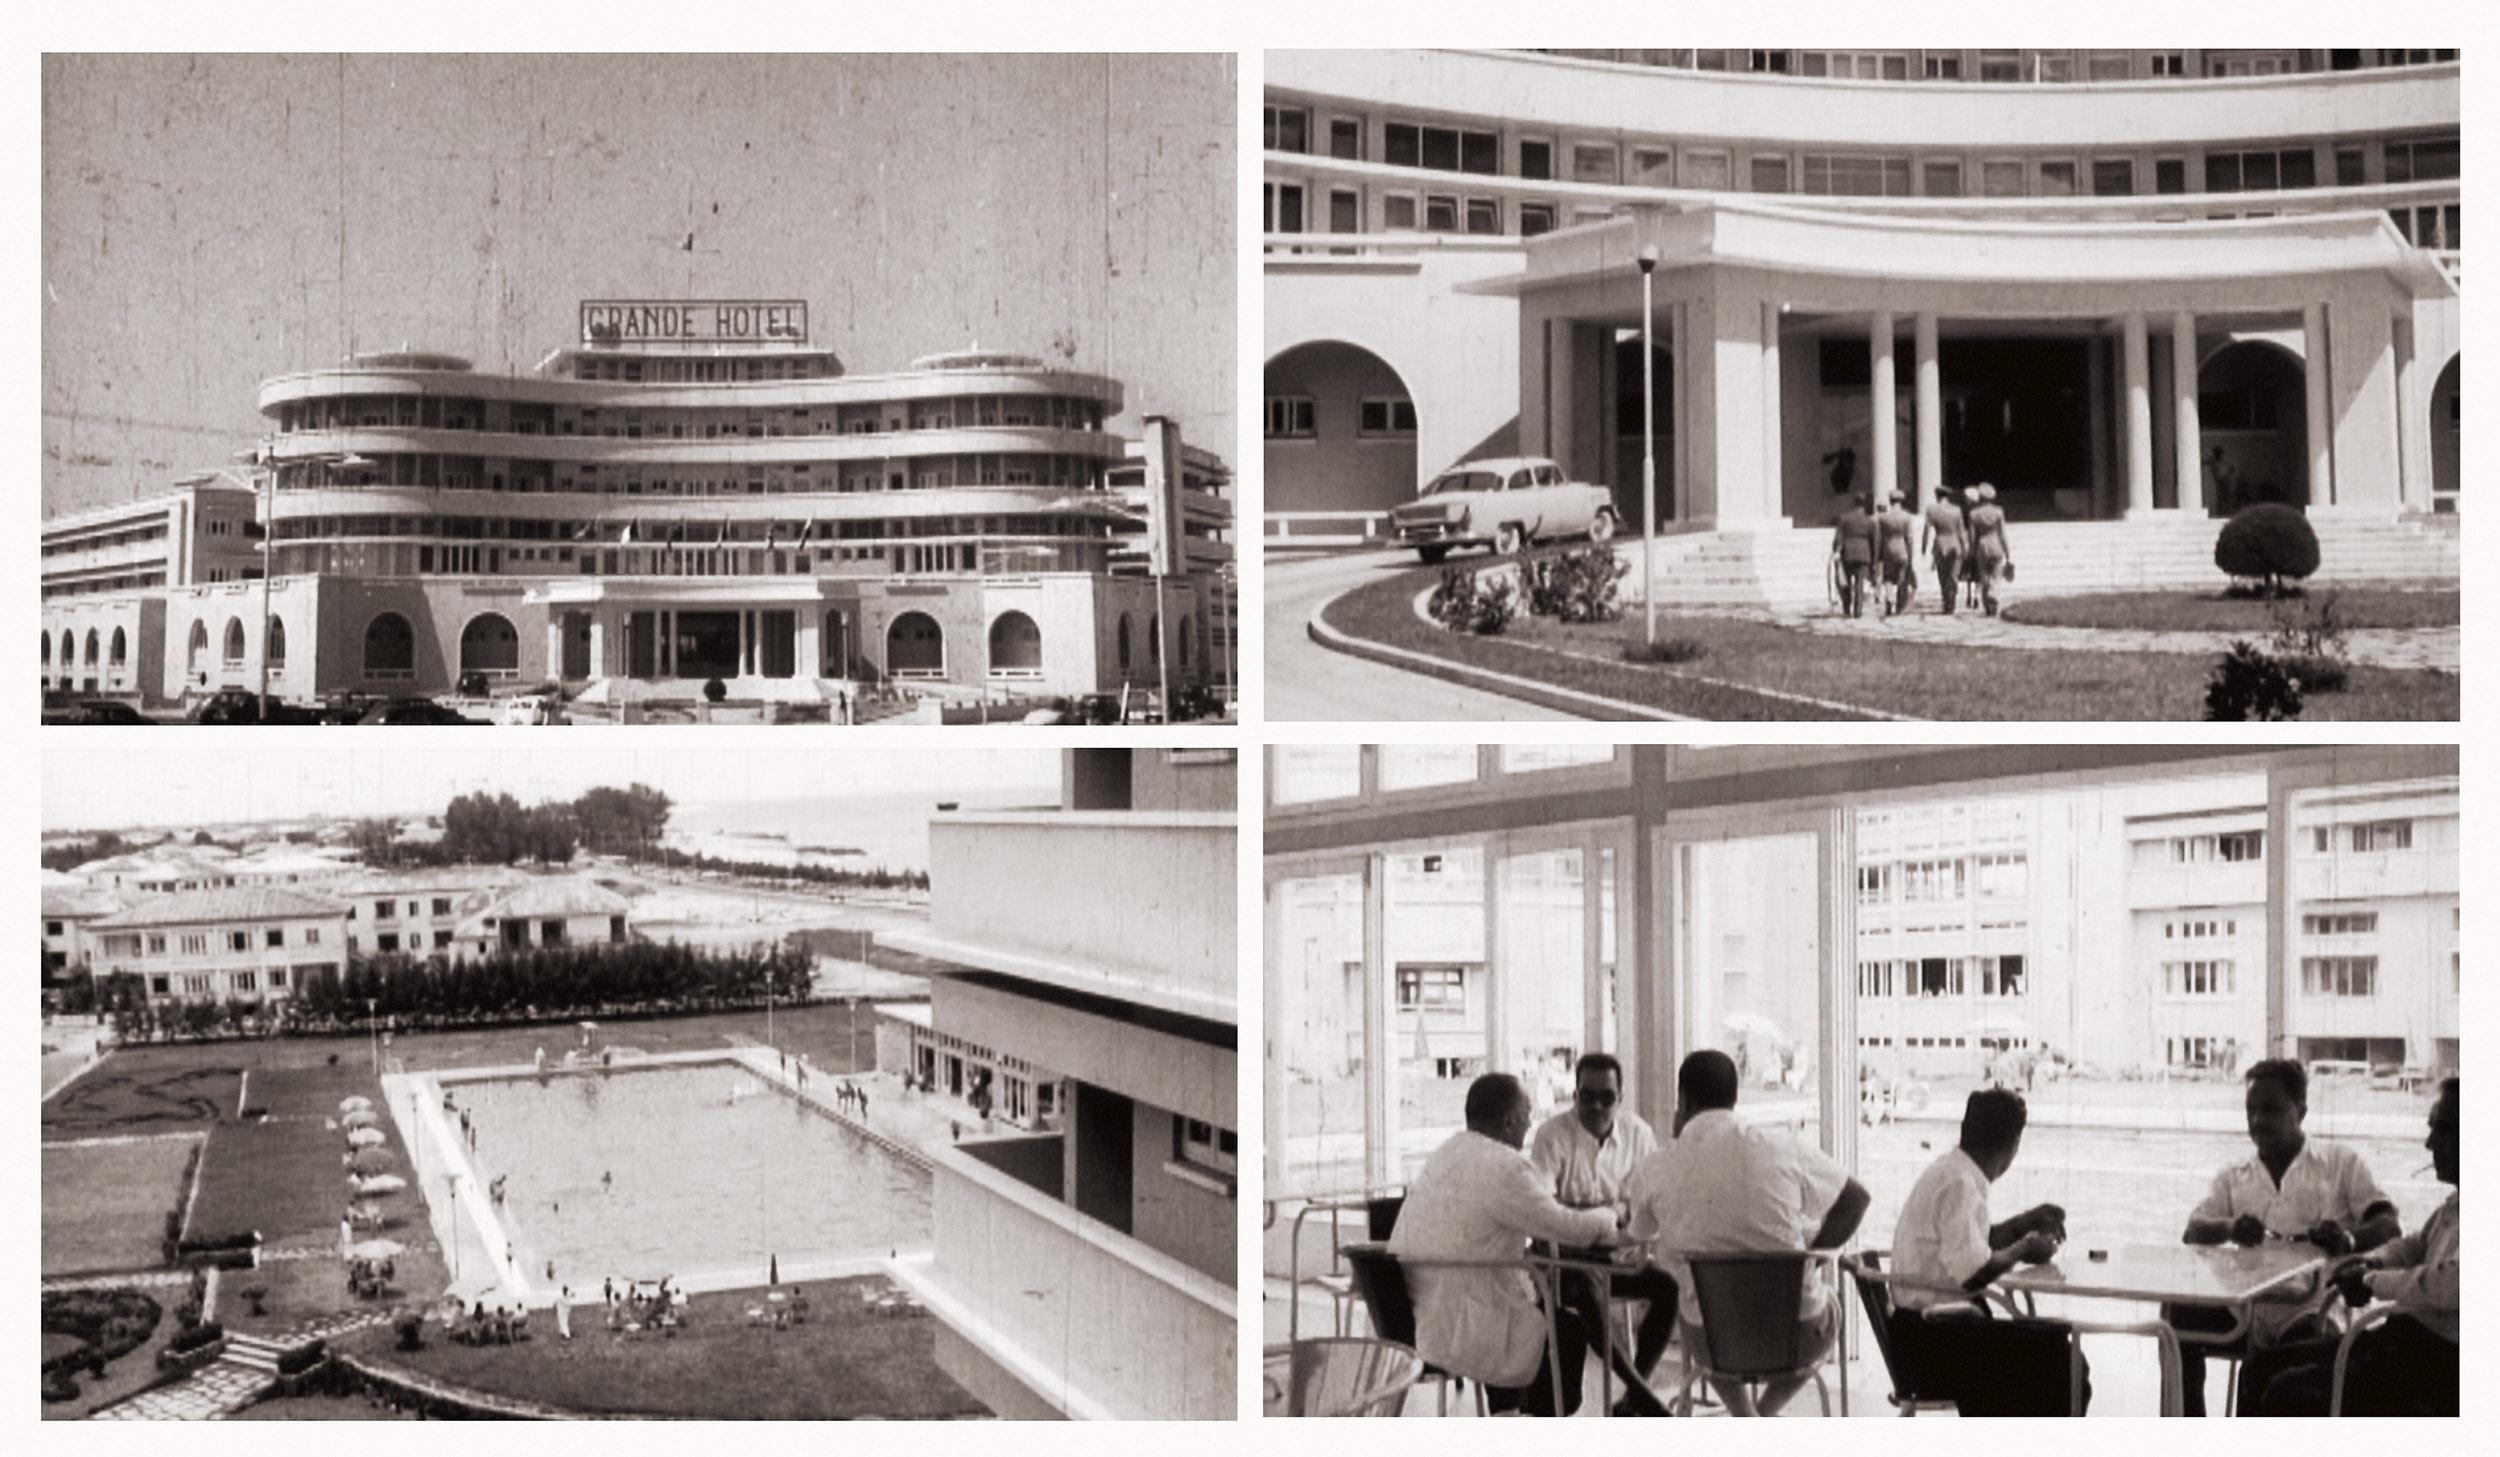 GRAND HOTEL IN 1955